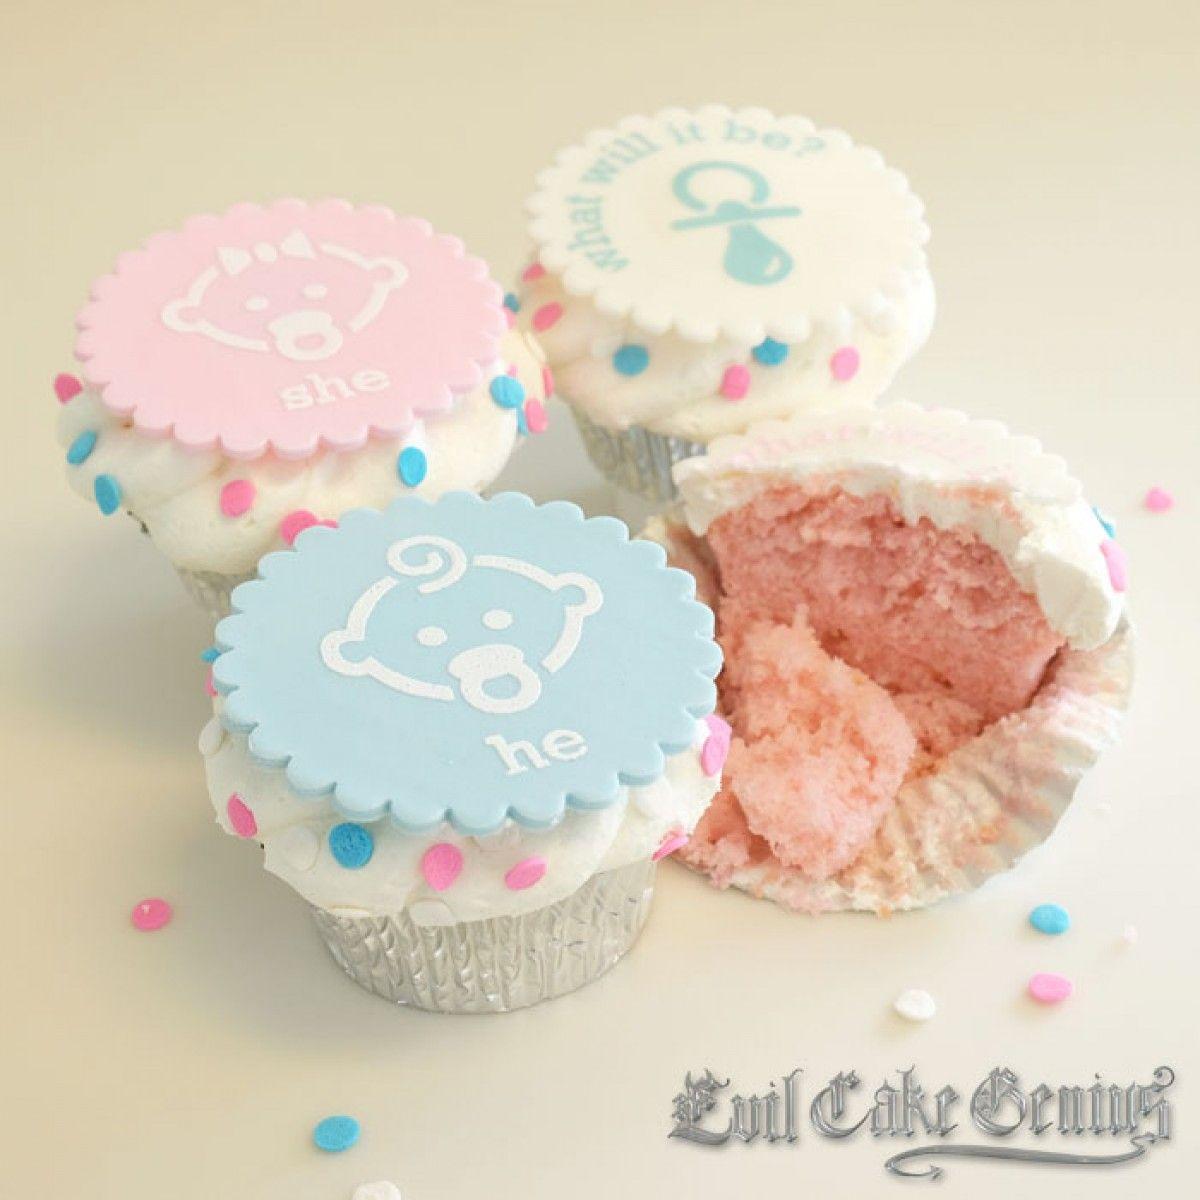 FacebookSticky Fingers Bakery Birthday Cake Seattle